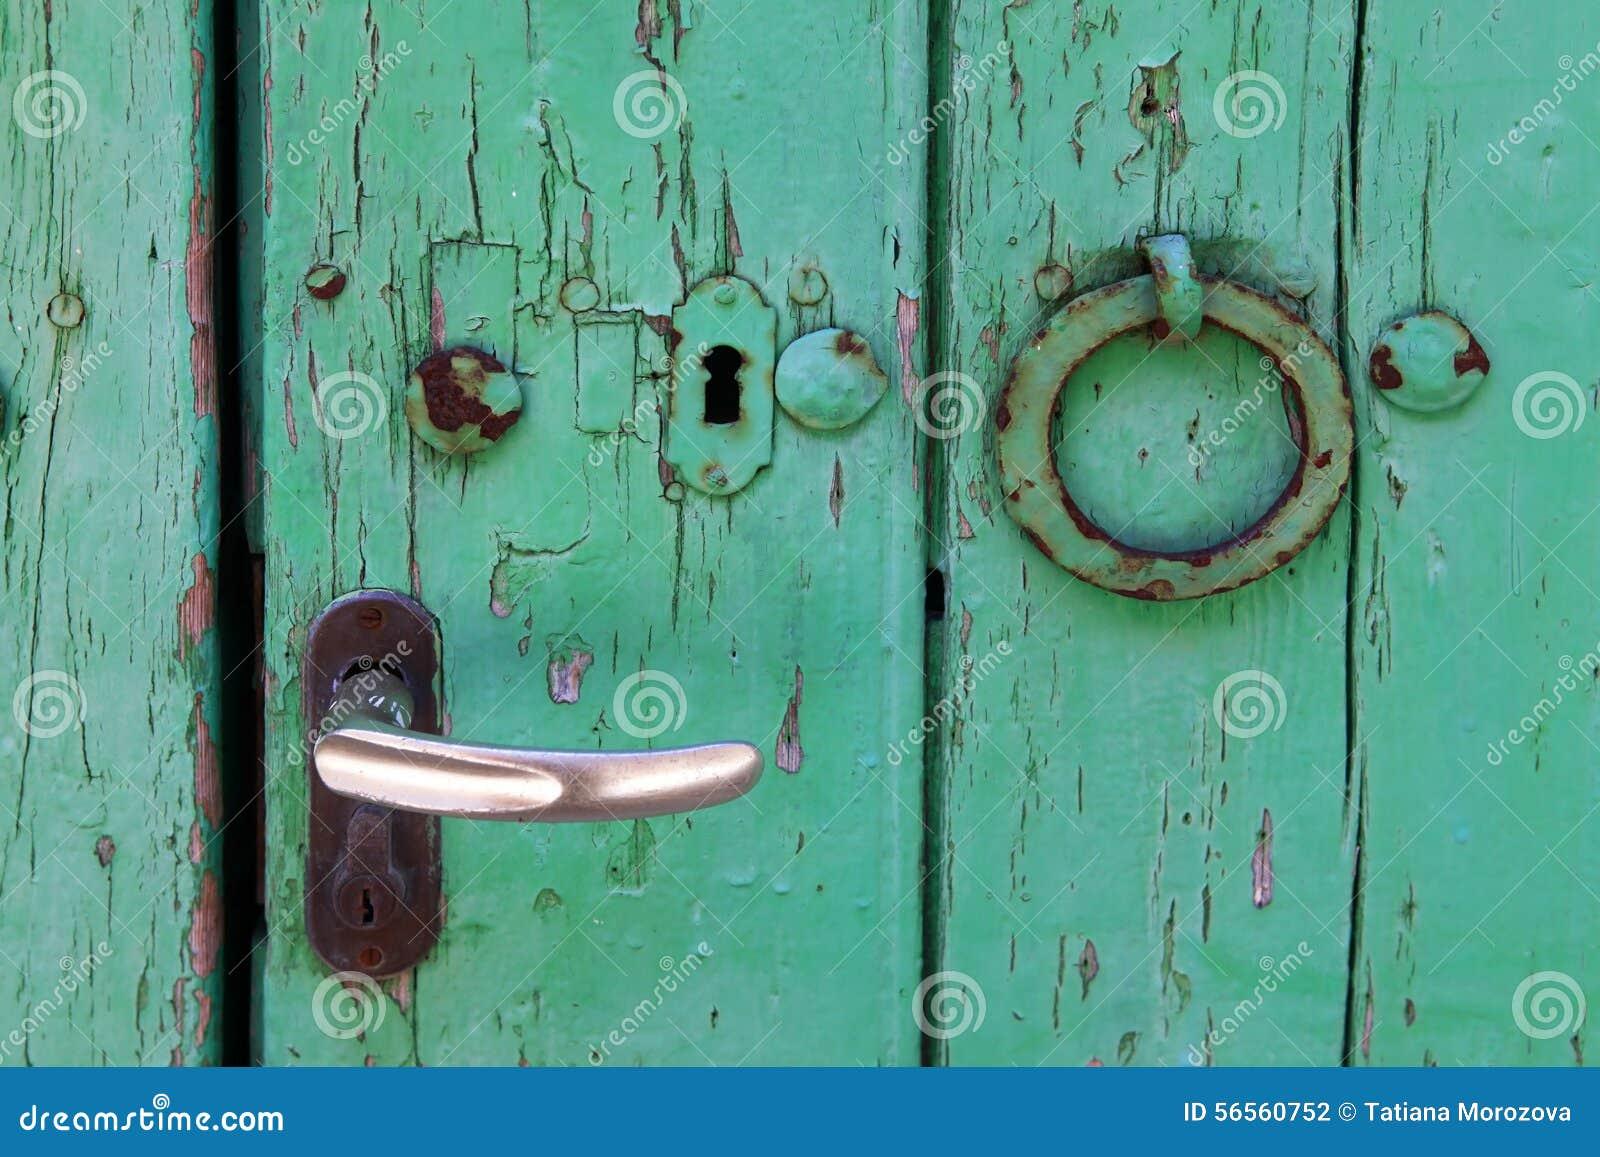 Download πόρτα παλαιά στοκ εικόνες. εικόνα από λεκιασμένος, ανασκόπησης - 56560752